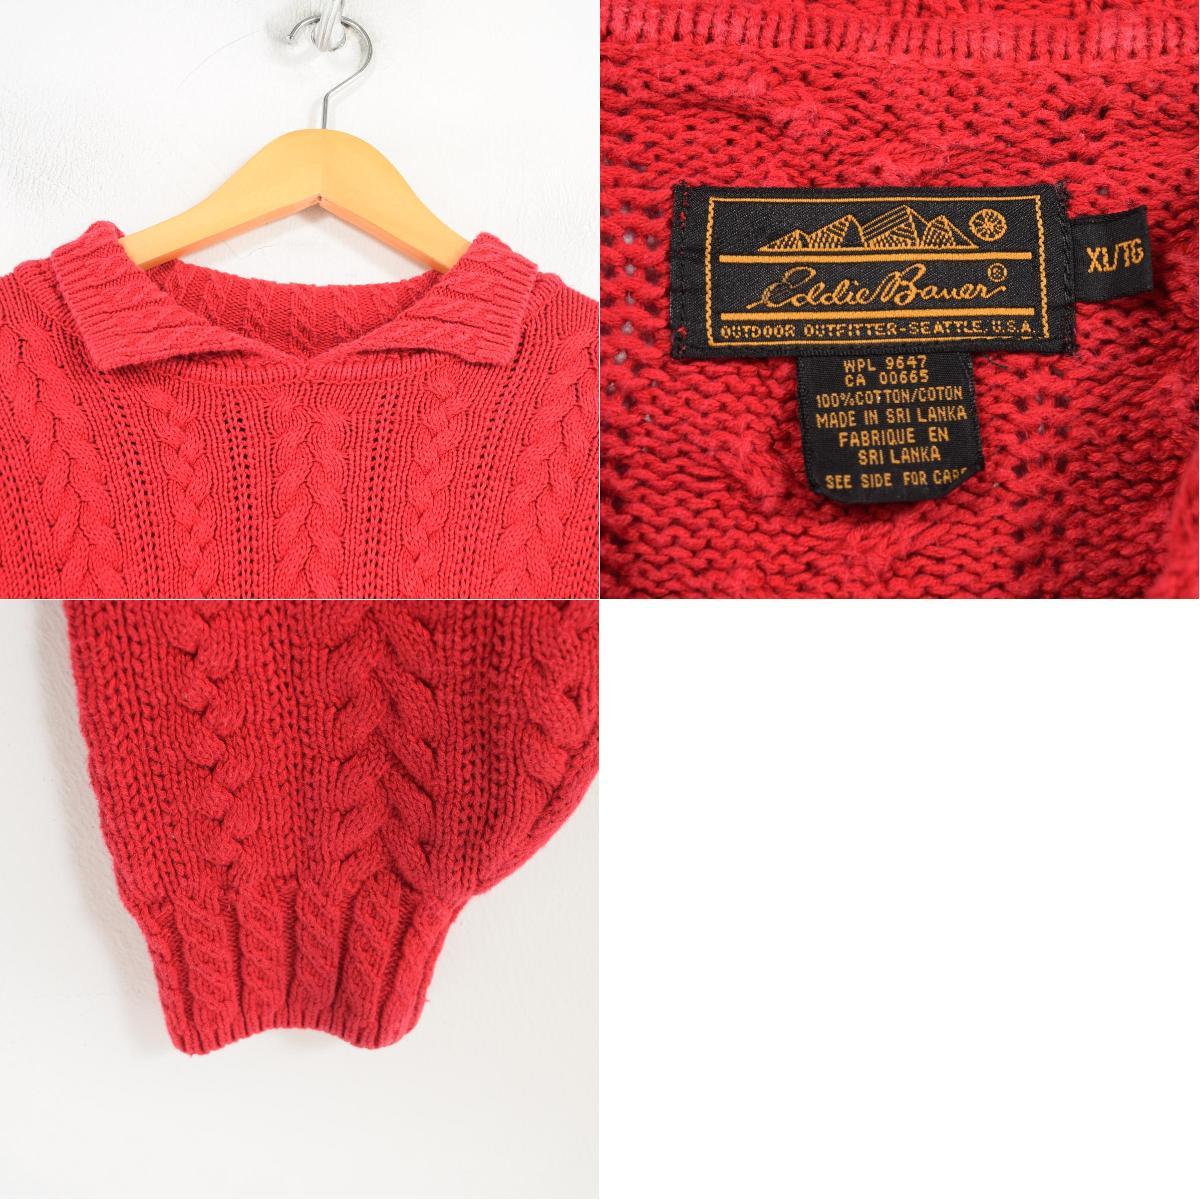 Vintage Clothing Jam Cotton Knit Sweater Ladys Xxl Vintage